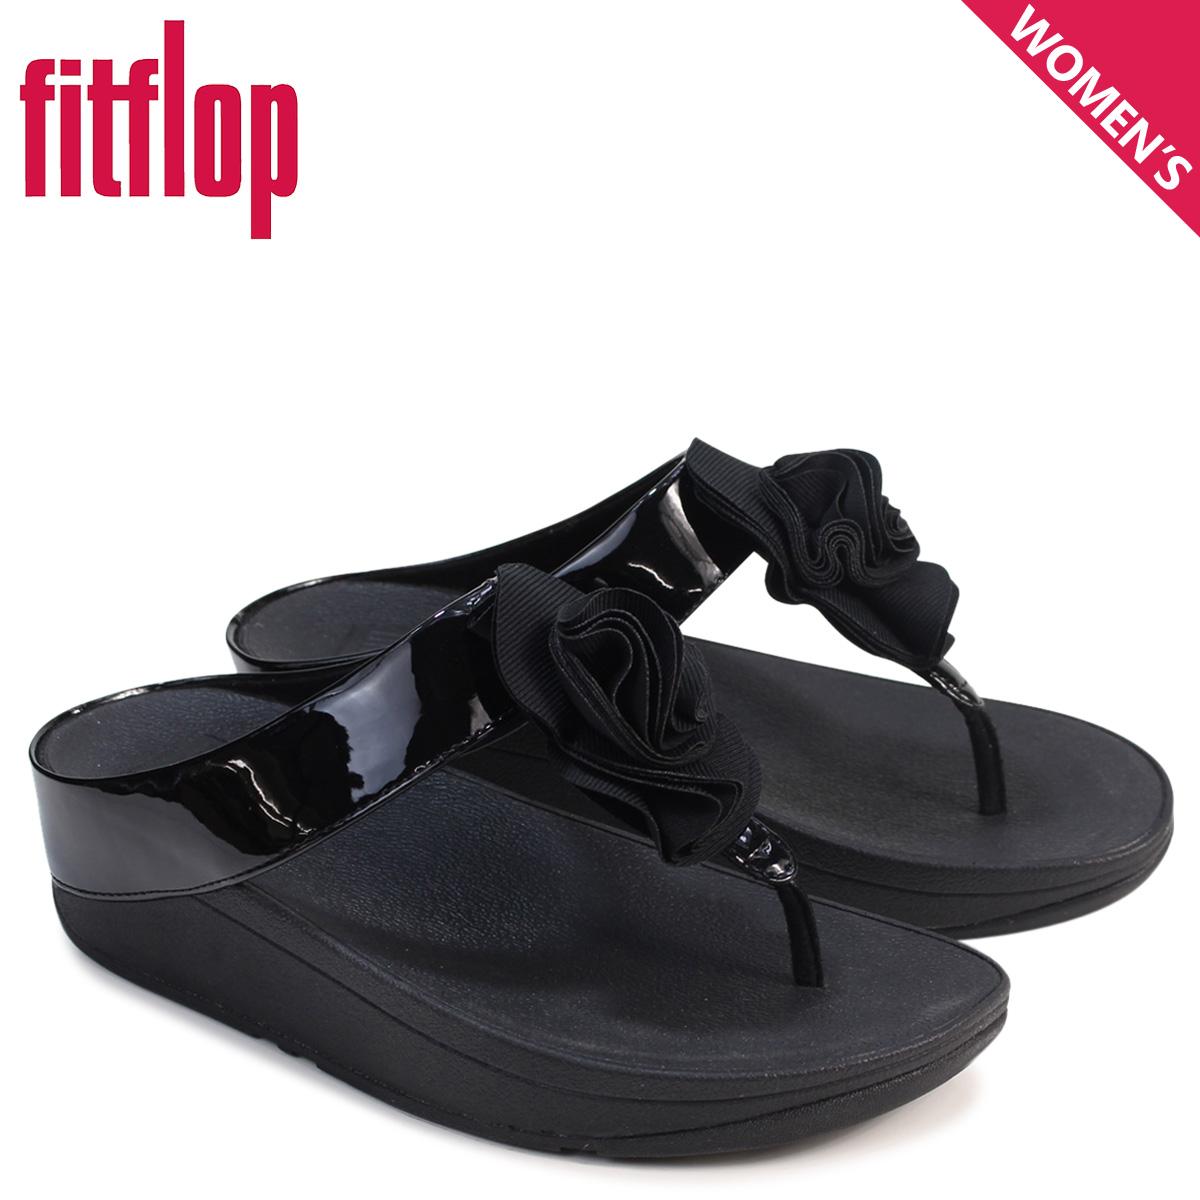 8d1f0909b191 FitFlop sandals fitting FLOP Florey FLORRIE TOE-POST C91 Lady s  4 4  Shinnyu load